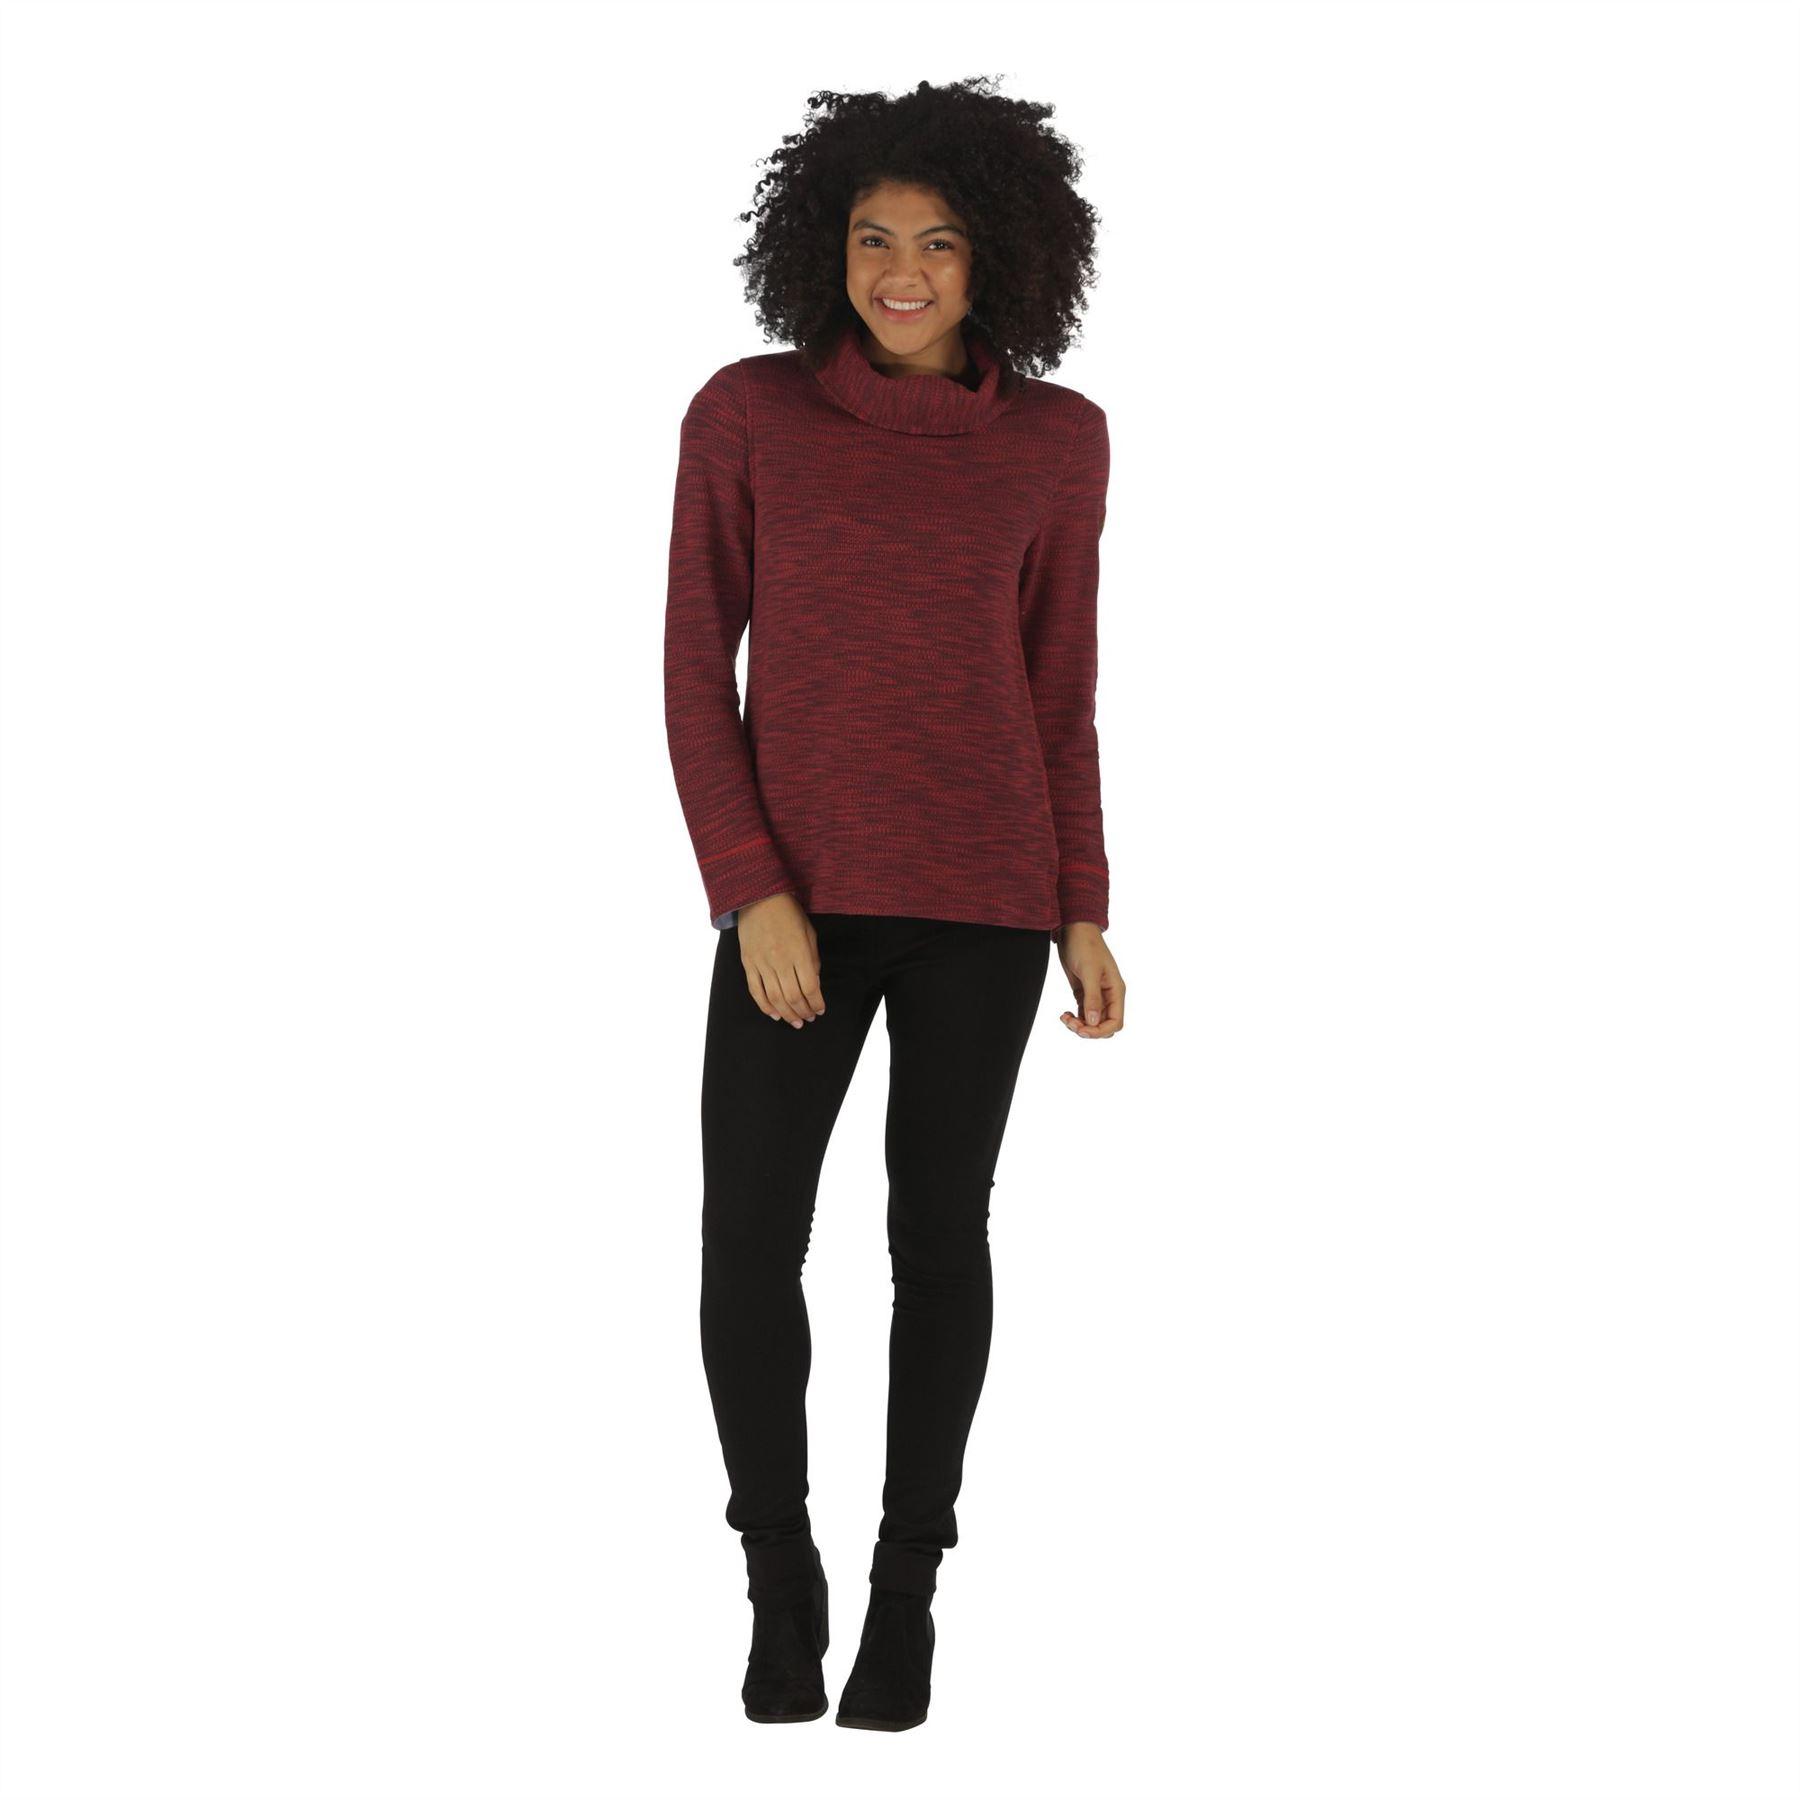 Regatta-Ceanna-Cowl-Neck-Soft-Fleece-Pull-Over-Jumper-Sweater-Top-RWA276 thumbnail 10